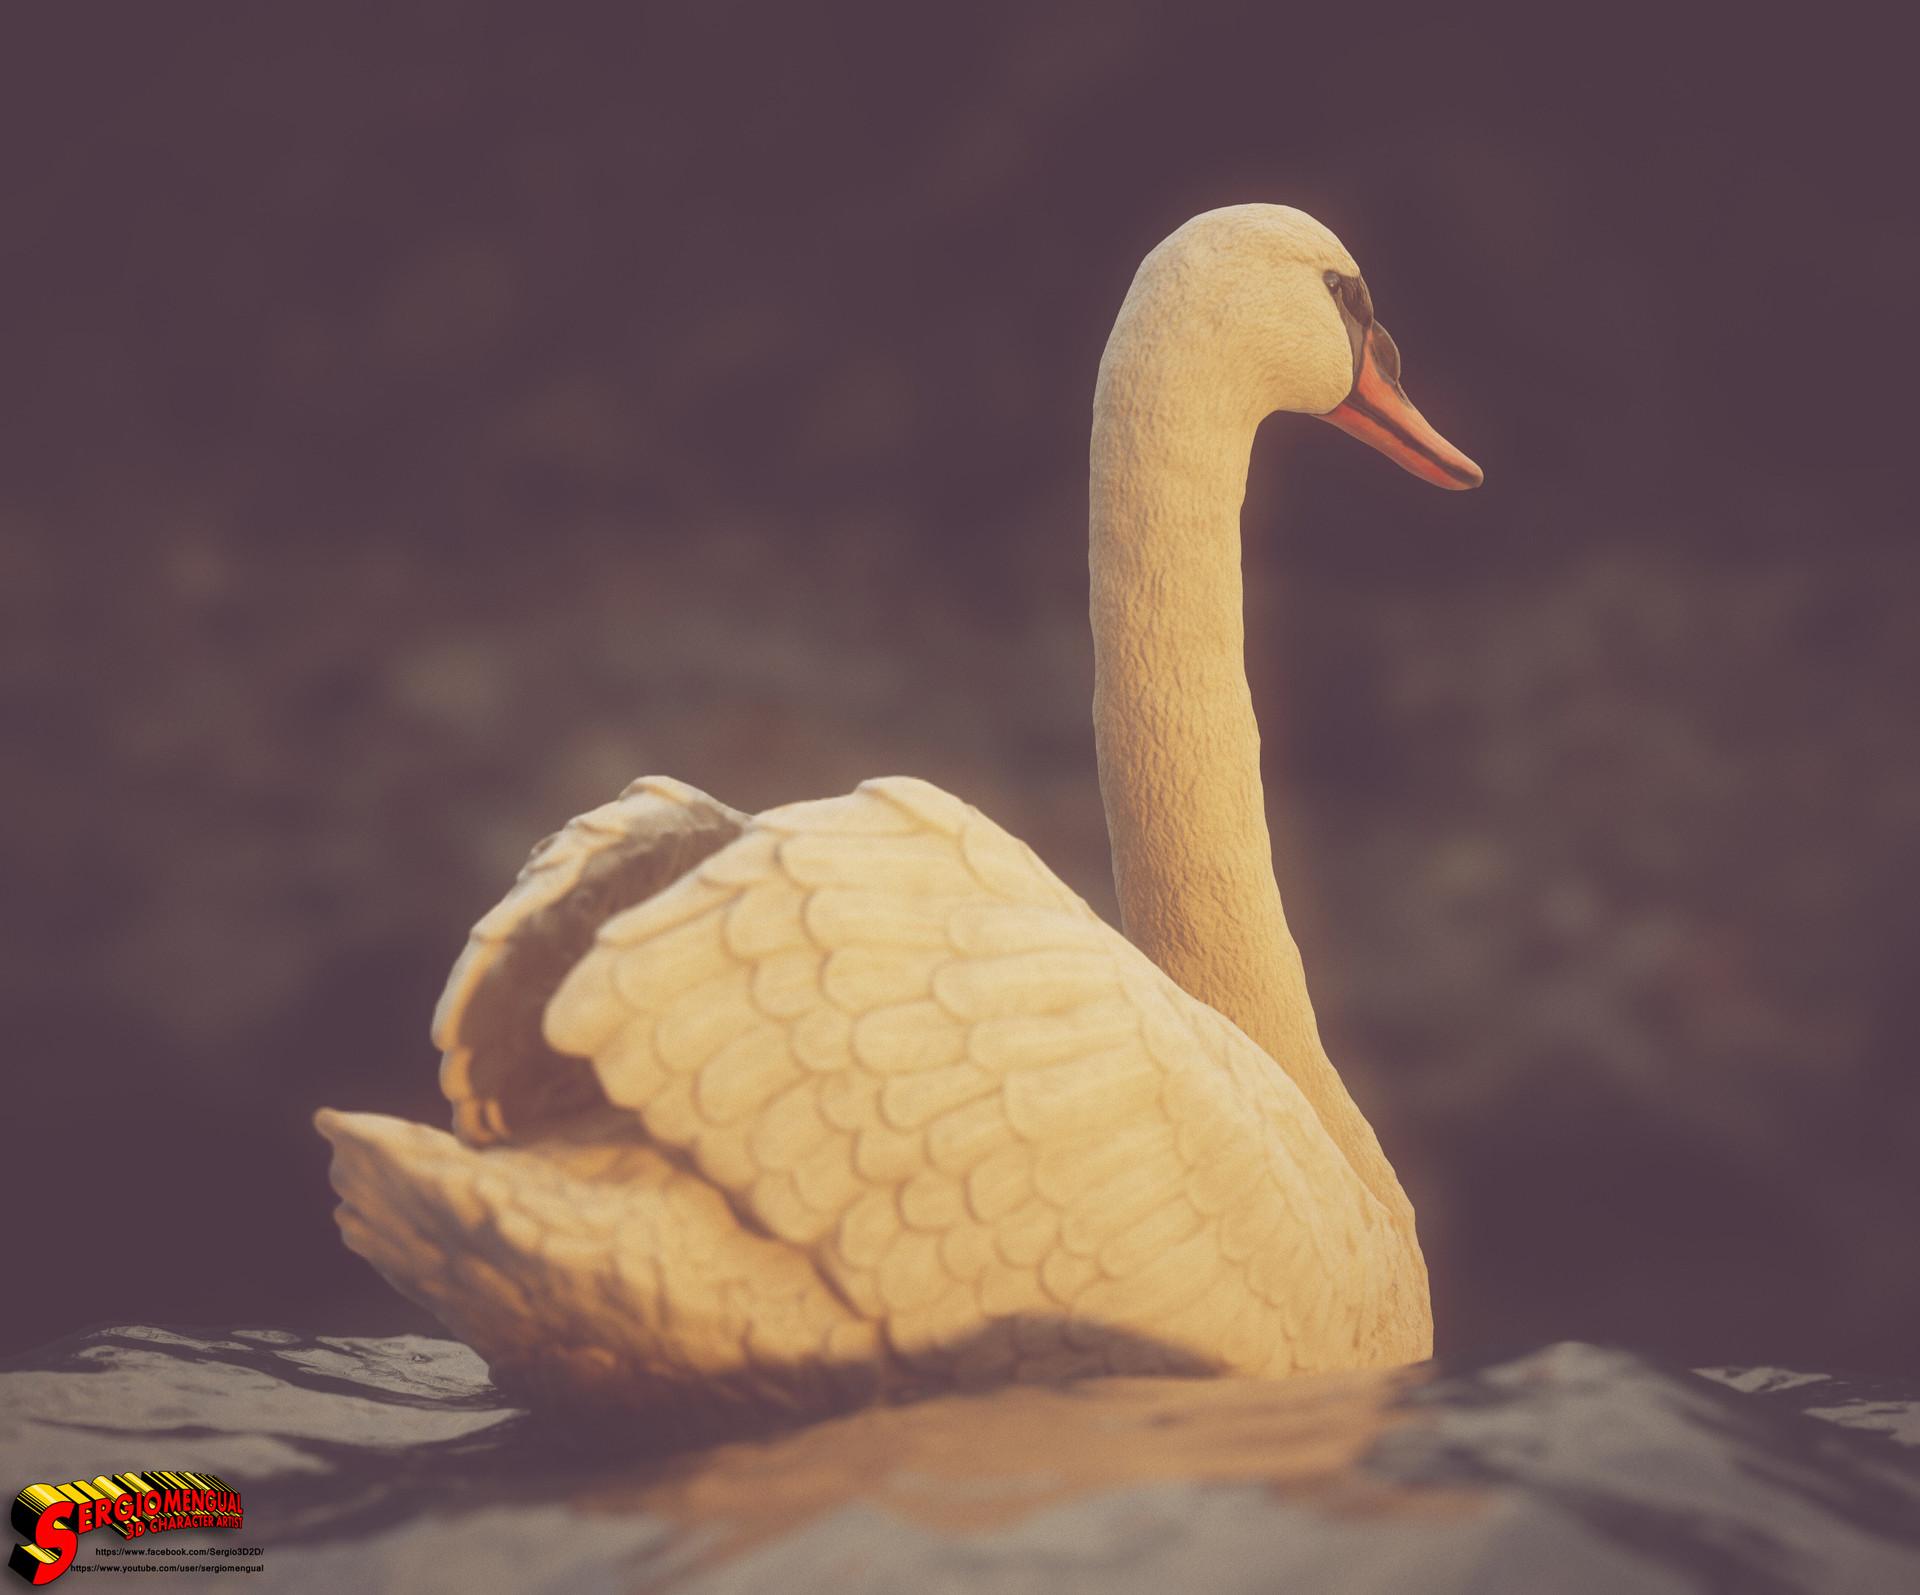 Sergio gabriel mengual swan square 4